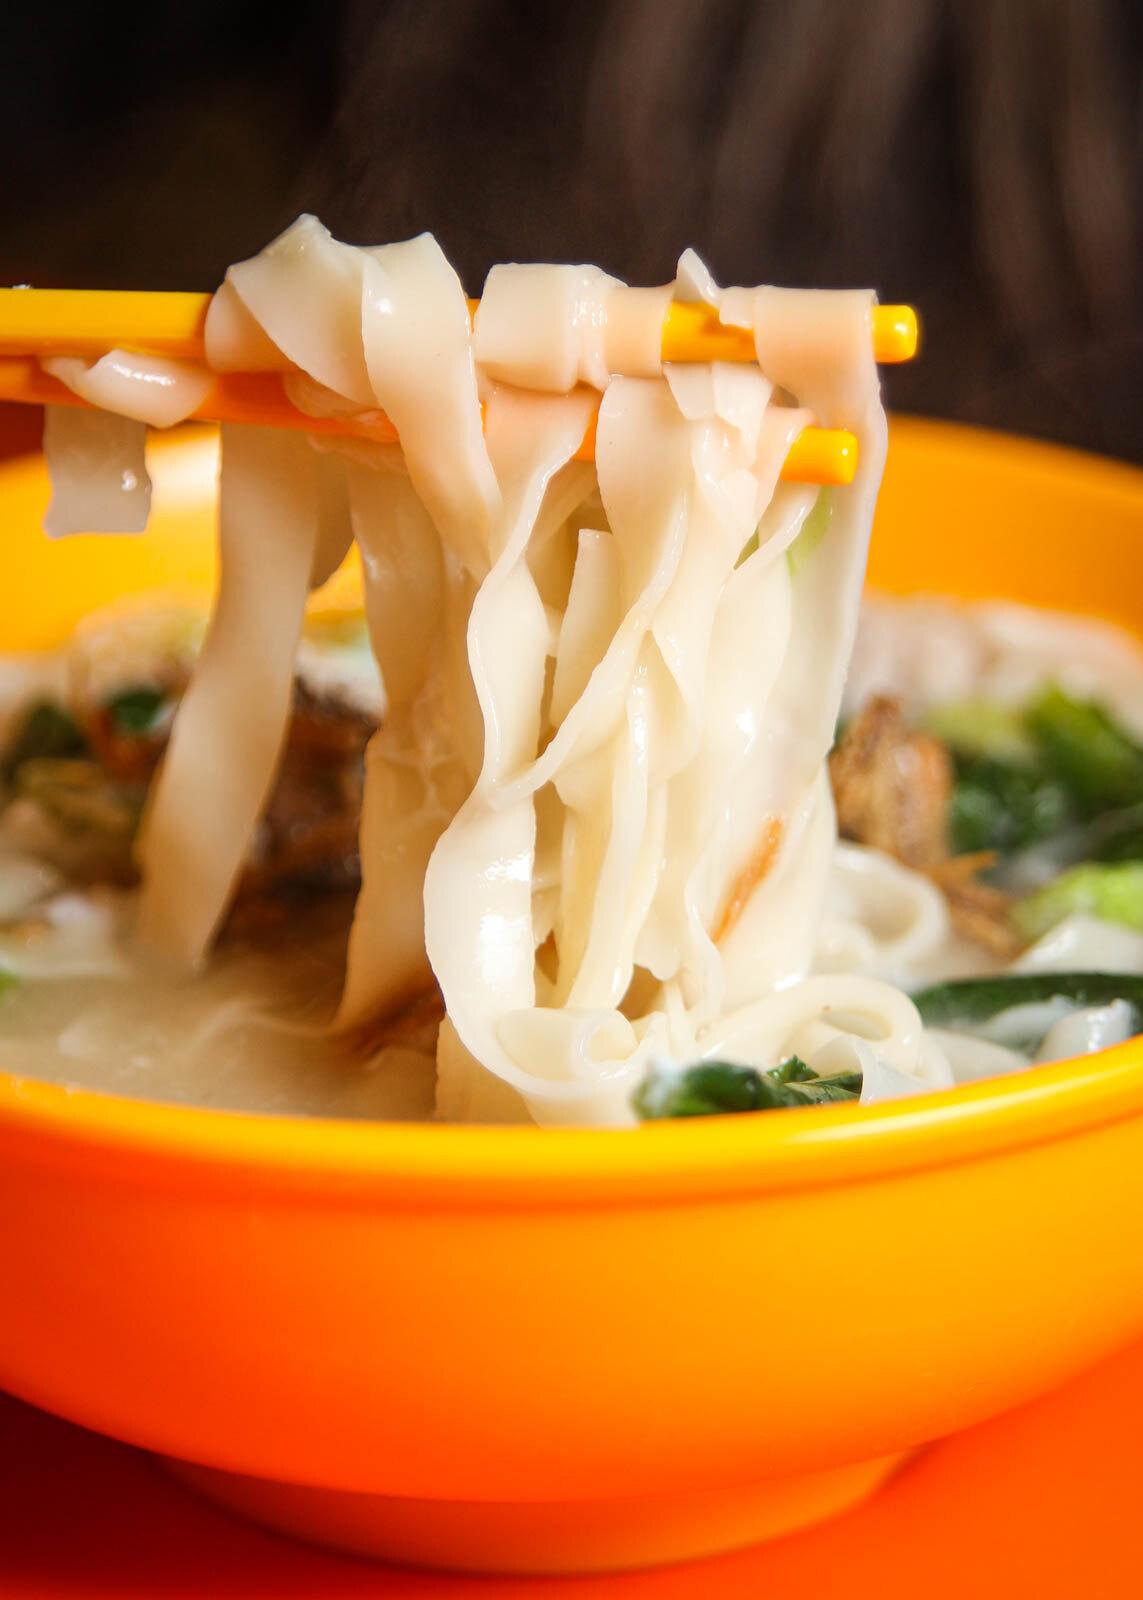 勿洛忠兴潘基文勉noodlepull